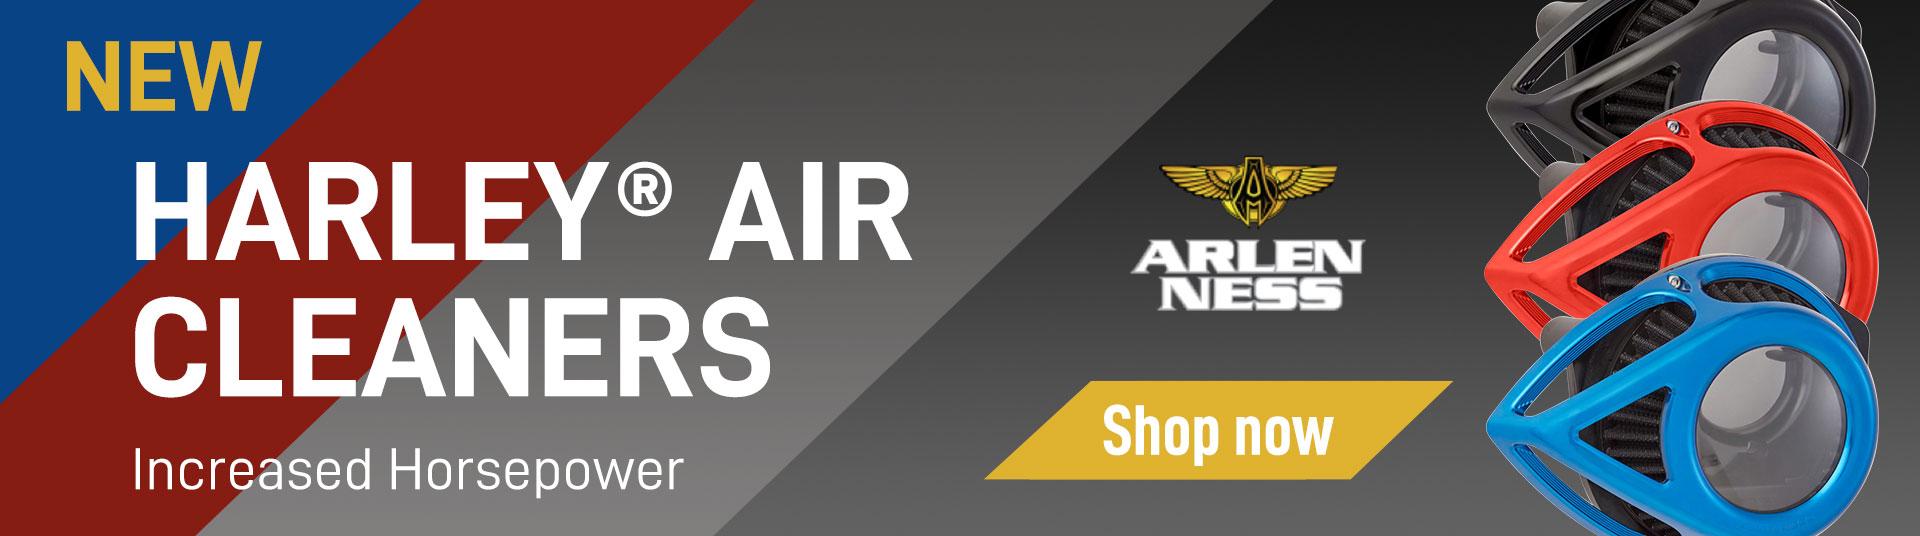 billetproofdesign.com-ad-arlen-ness-air-cleaners-1.jpg